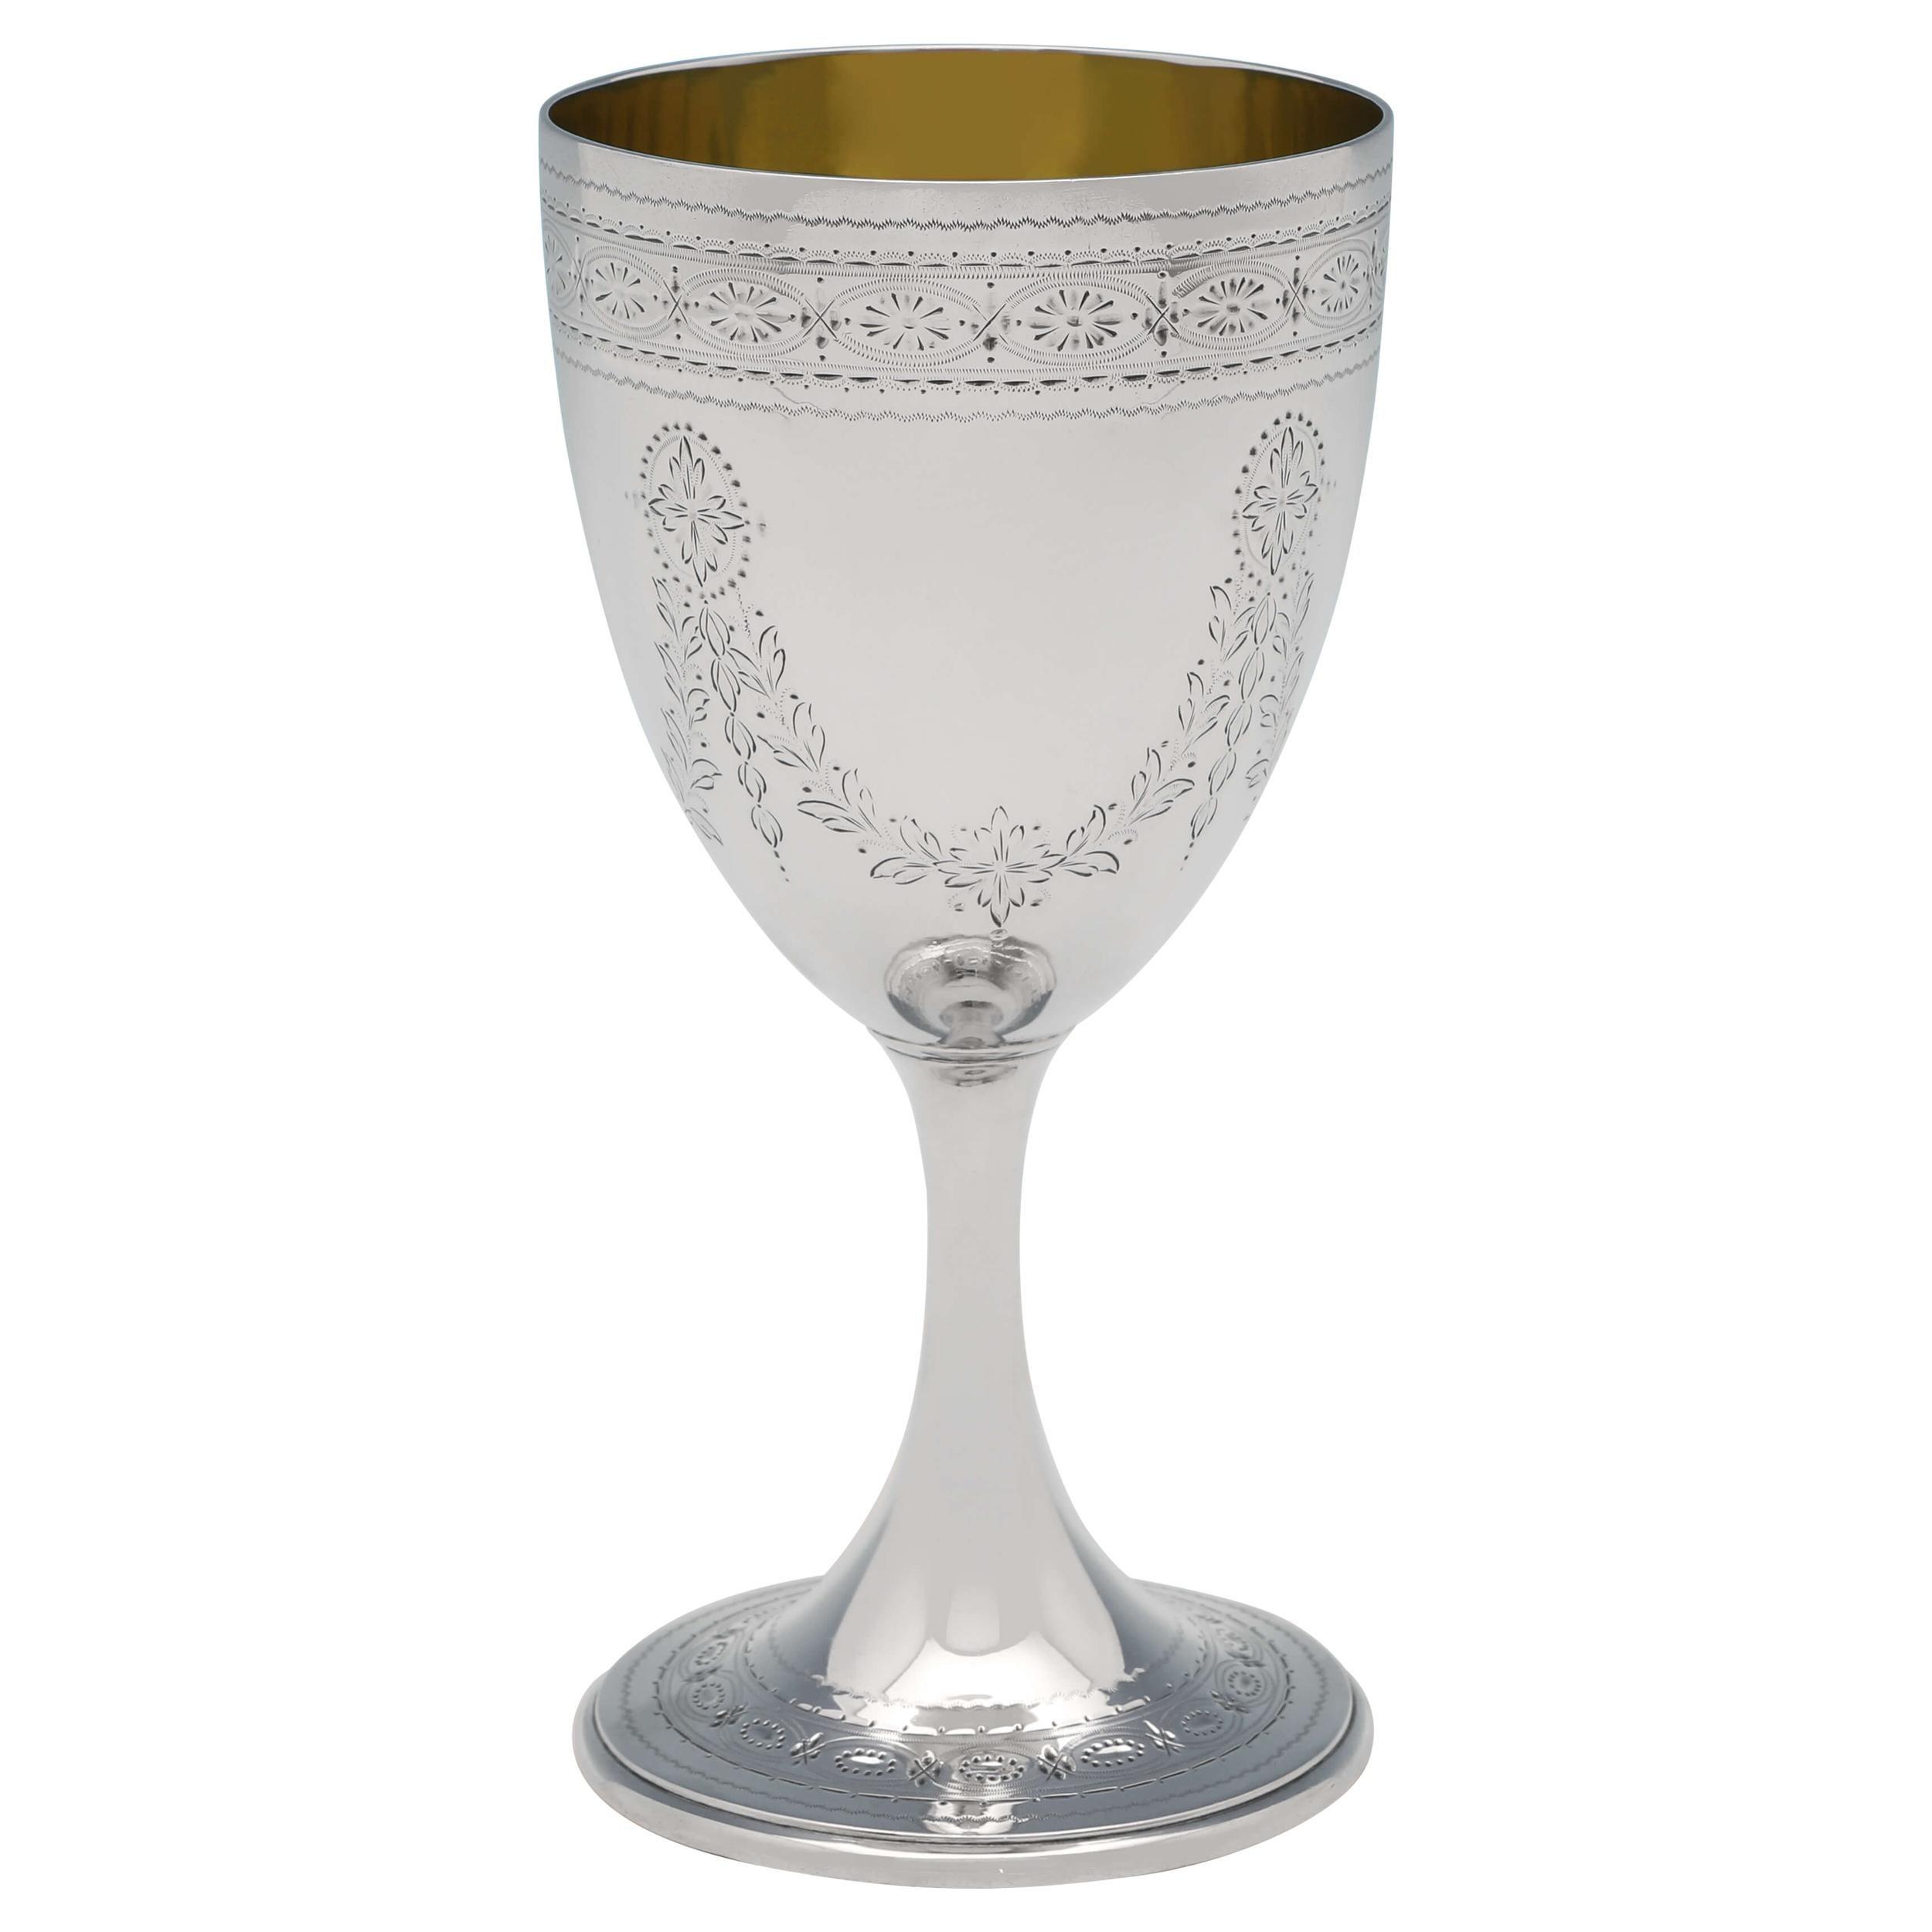 Barnards Victorian Engraved Sterling Silver Goblet, Gilt Interior, 1872